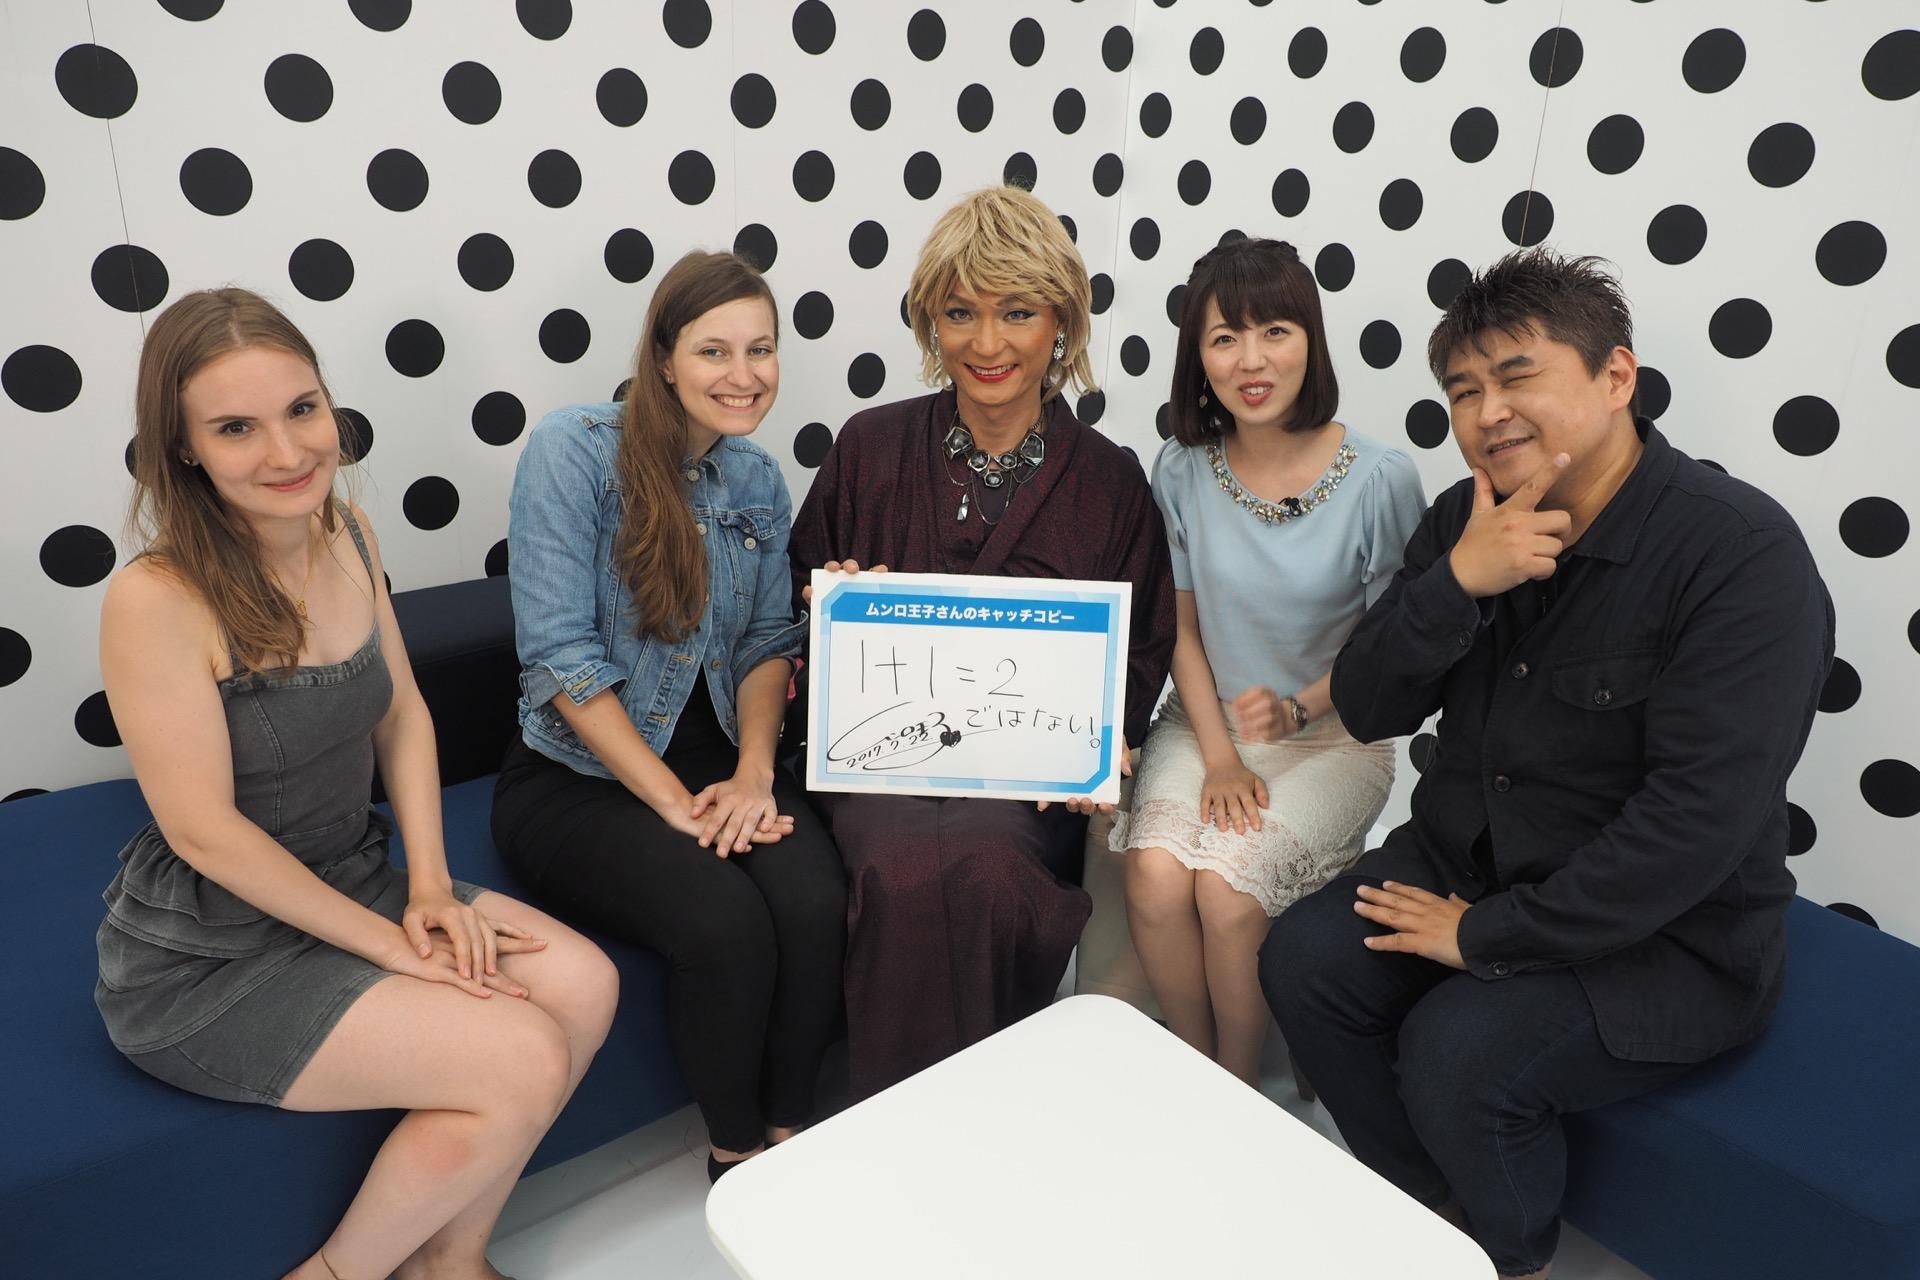 http://www.machikado-creative.jp/wordpress/wp-content/uploads/2017/08/1d30e937e1a1b1ccf909830964125287.jpg